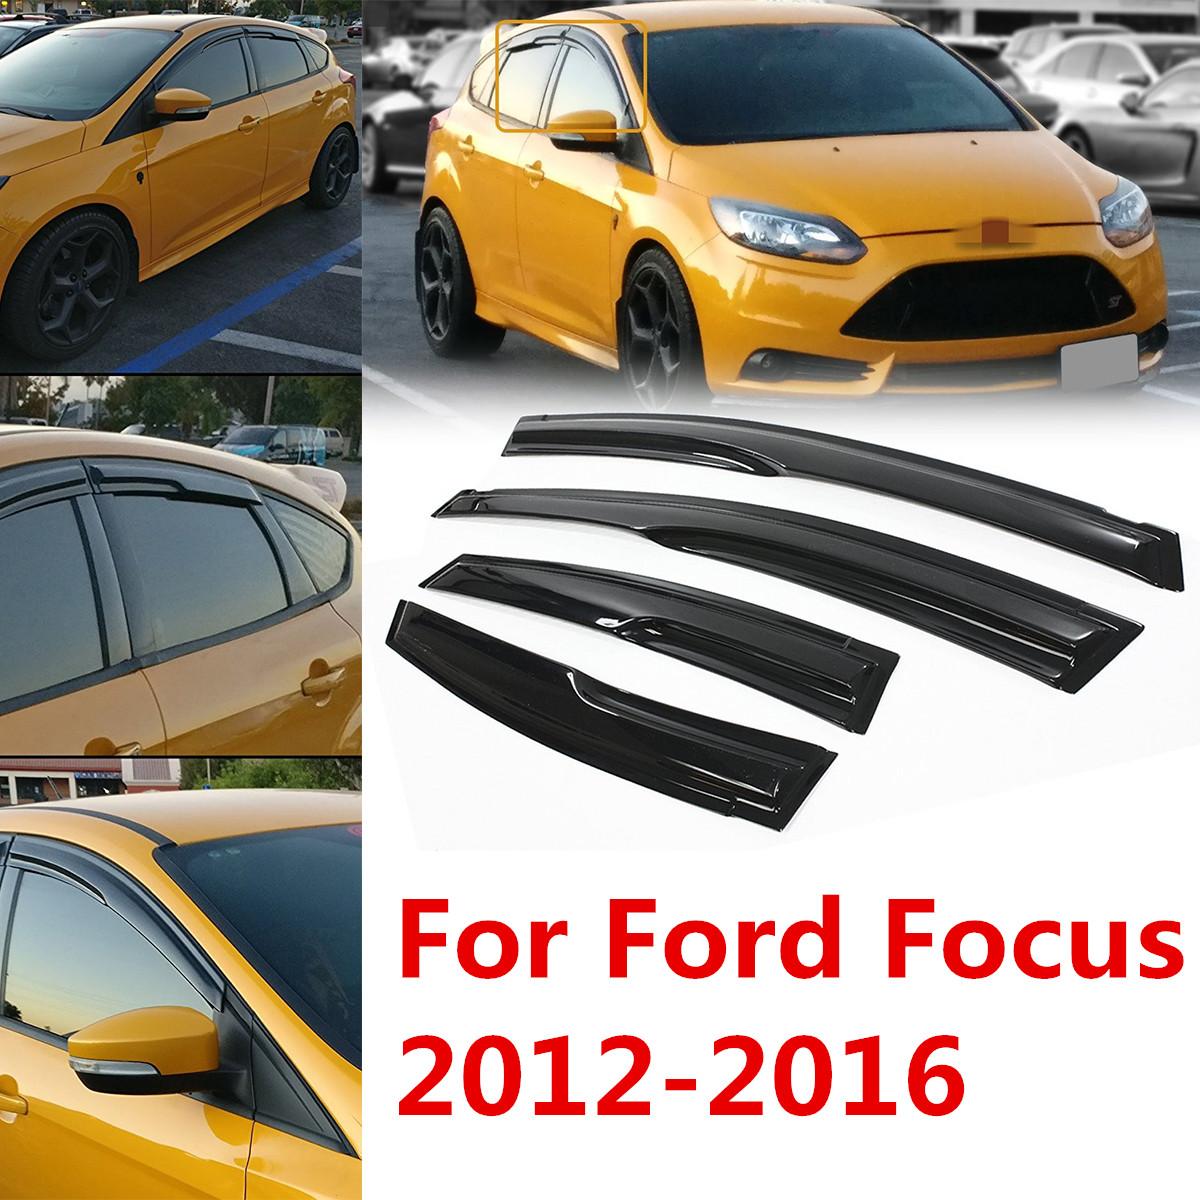 For 2012 2016 2013 2014 2015 Ford Focus 4 Door Sedan Window Visor Hatchback Shade 4pcs